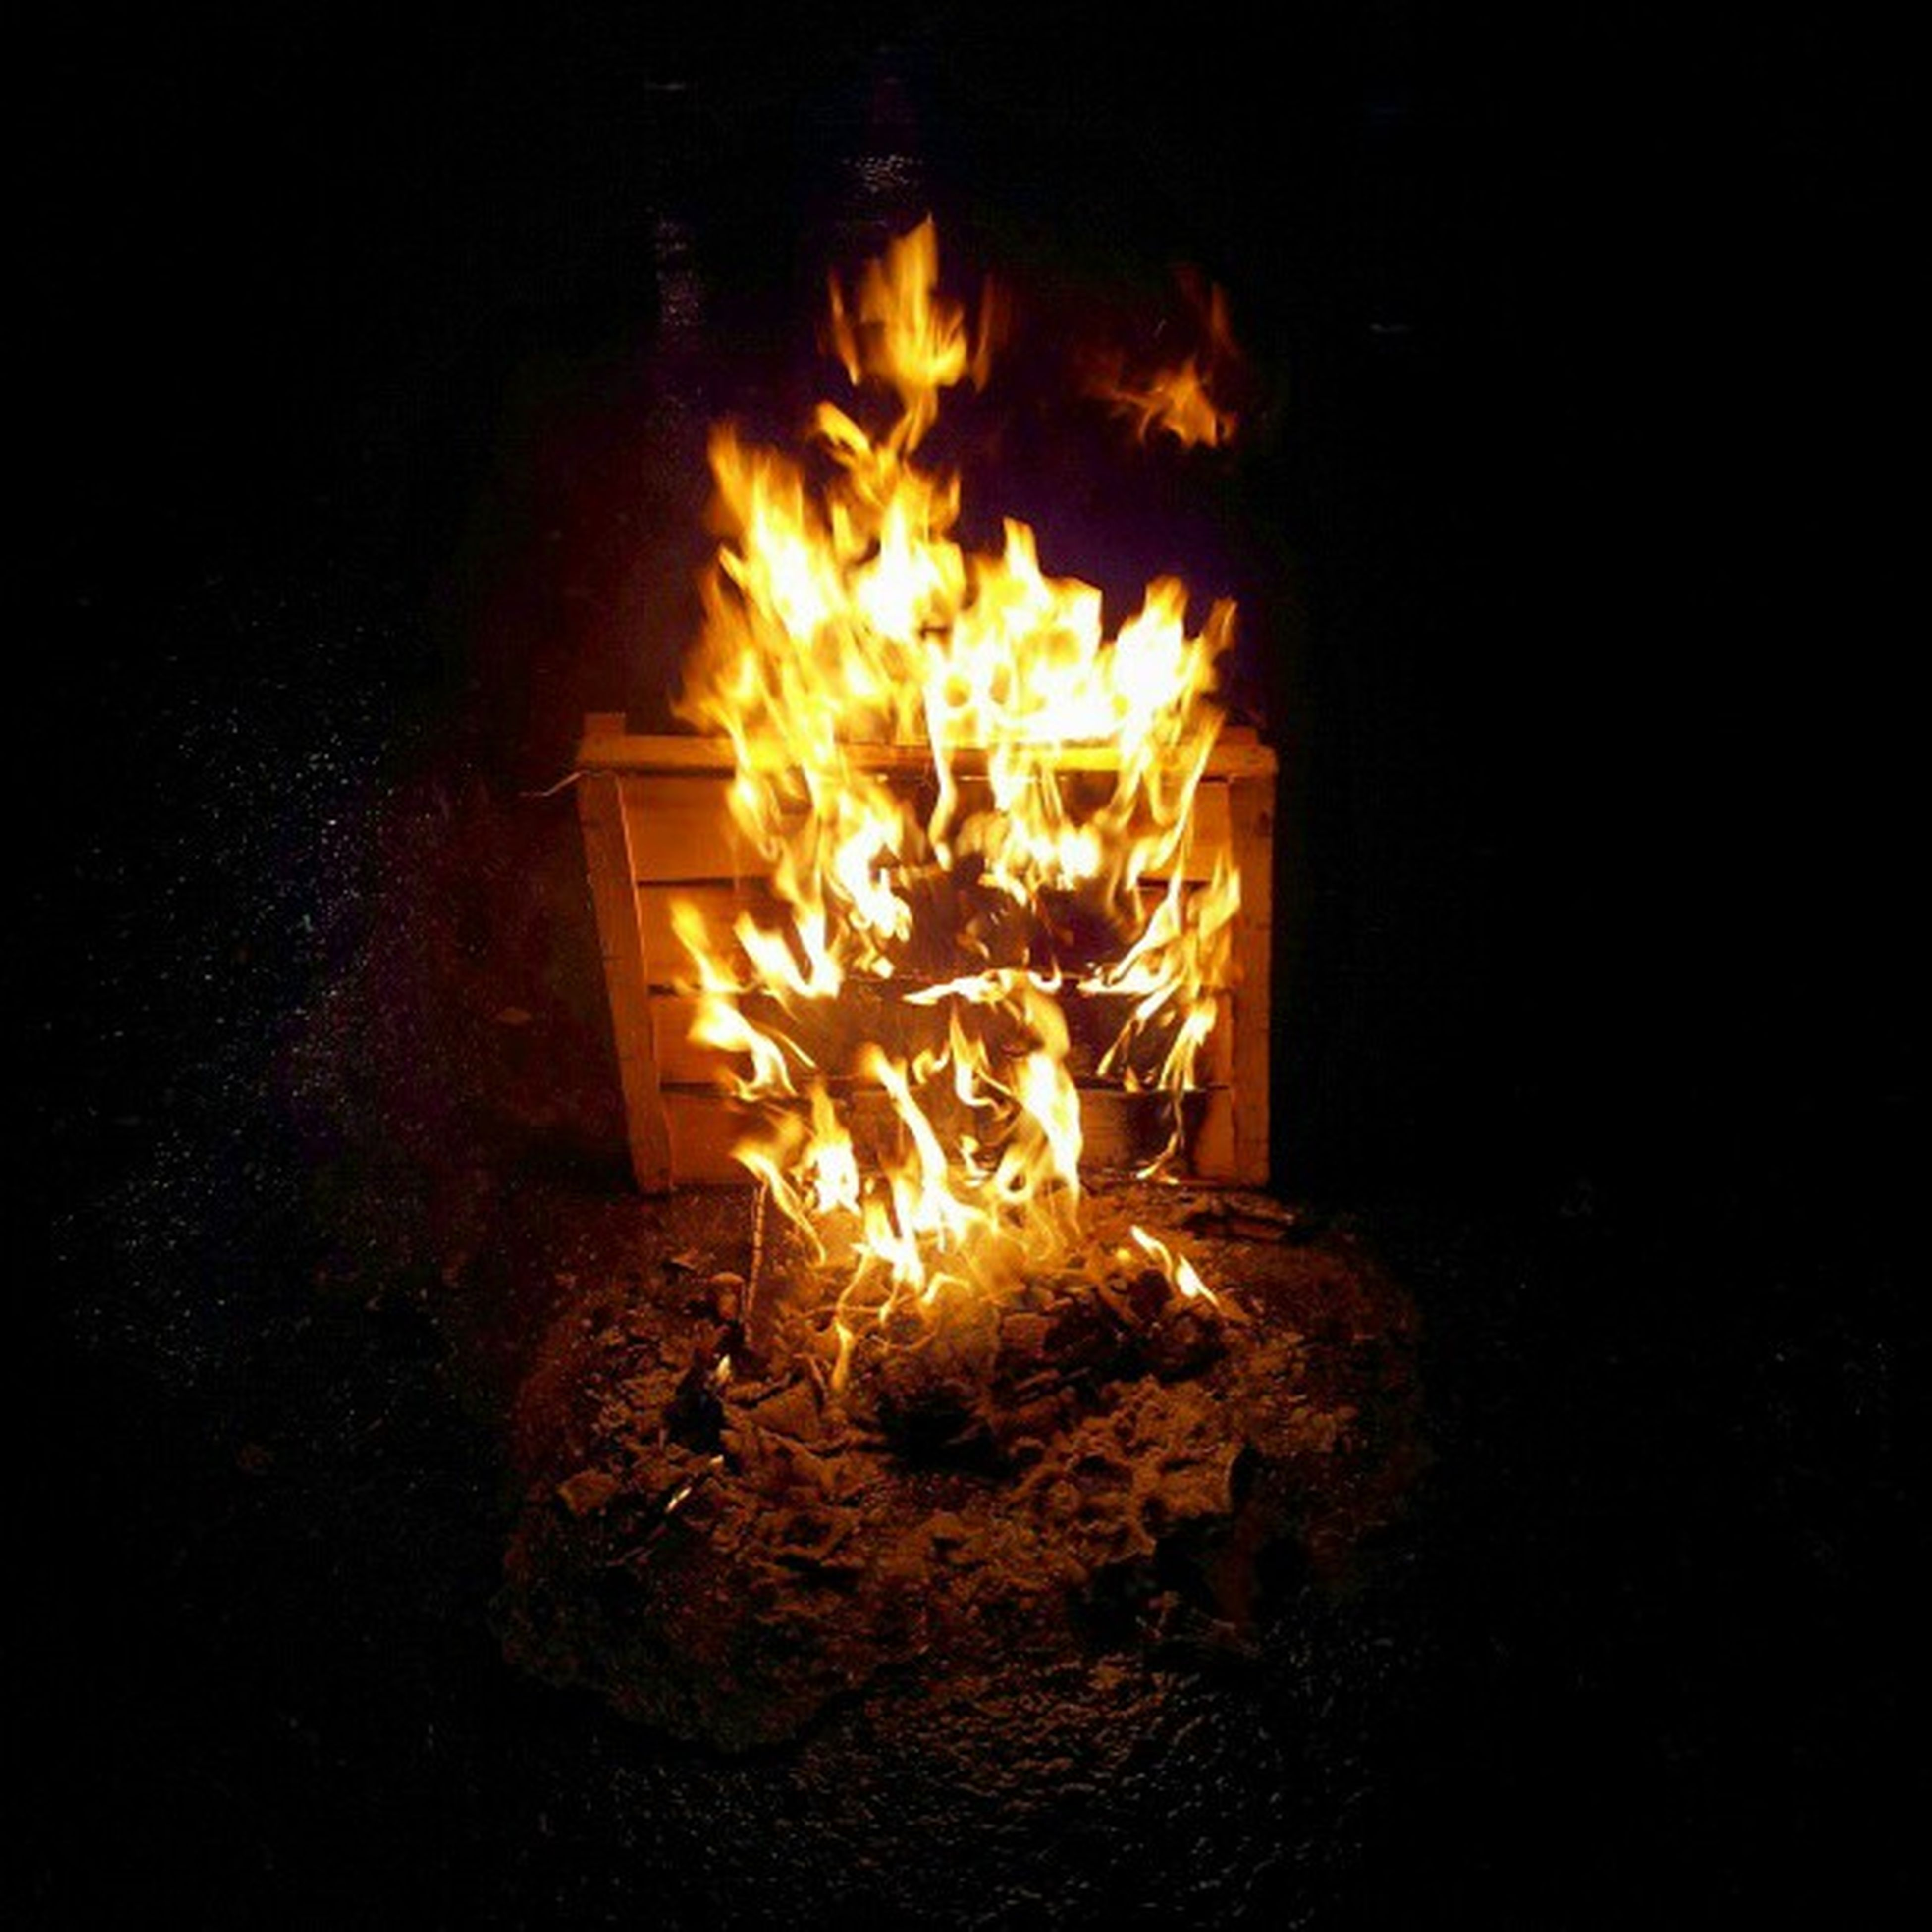 flame, burning, fire - natural phenomenon, heat - temperature, night, glowing, illuminated, dark, firewood, fire, indoors, bonfire, heat, candle, darkroom, light - natural phenomenon, lit, fireplace, close-up, no people